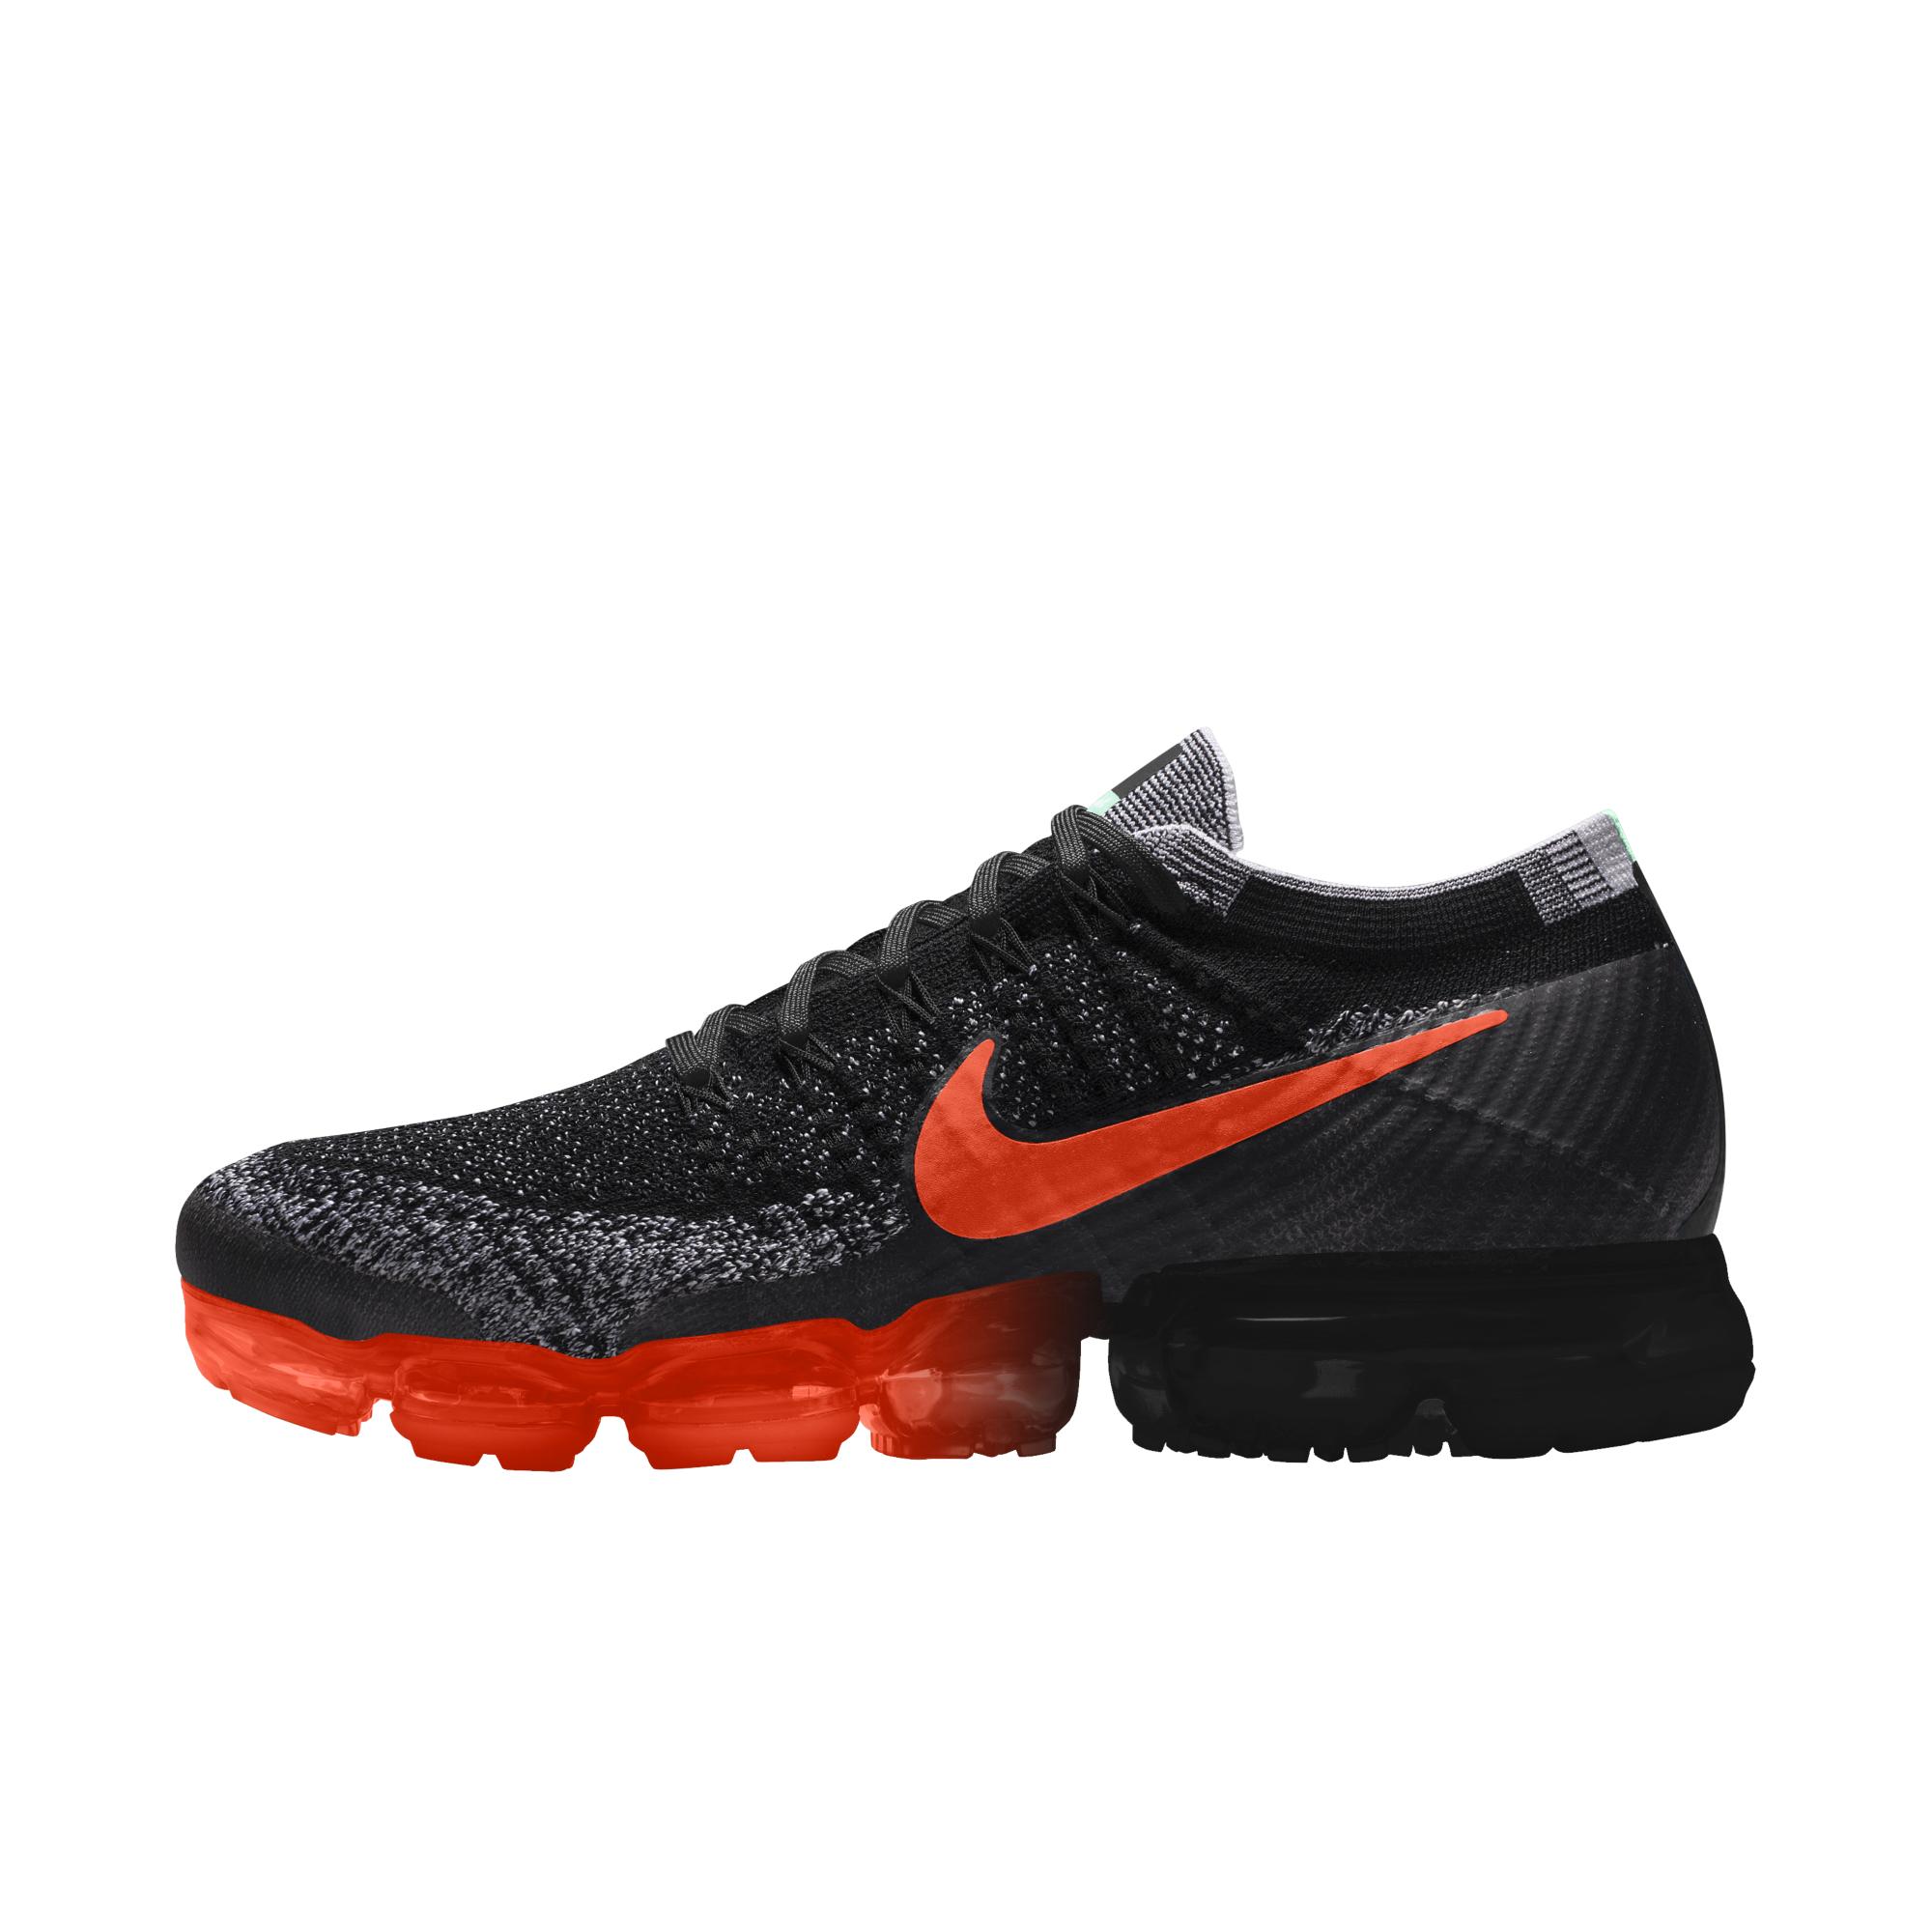 Nike Custom Shoes Review